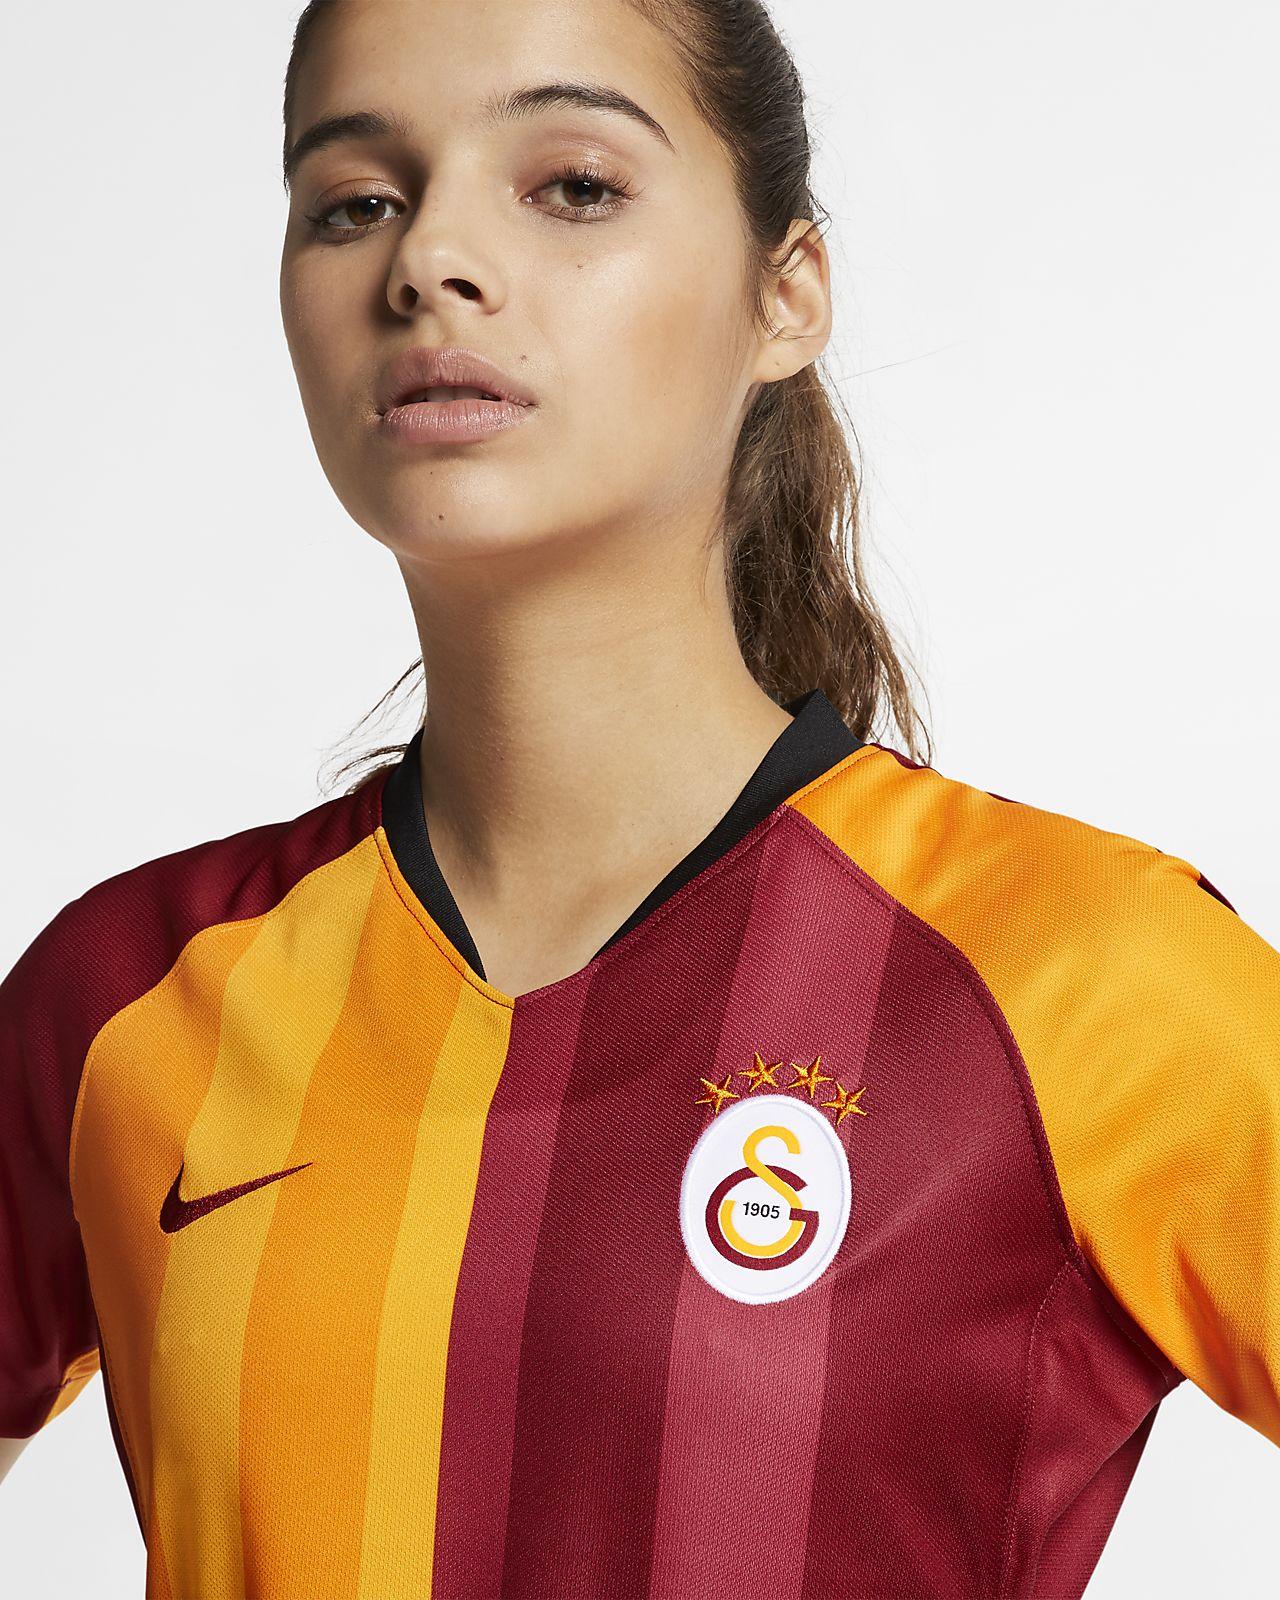 e113349af Galatasaray 2019/20 Stadium Home Women's Football Shirt. Nike.com ZA